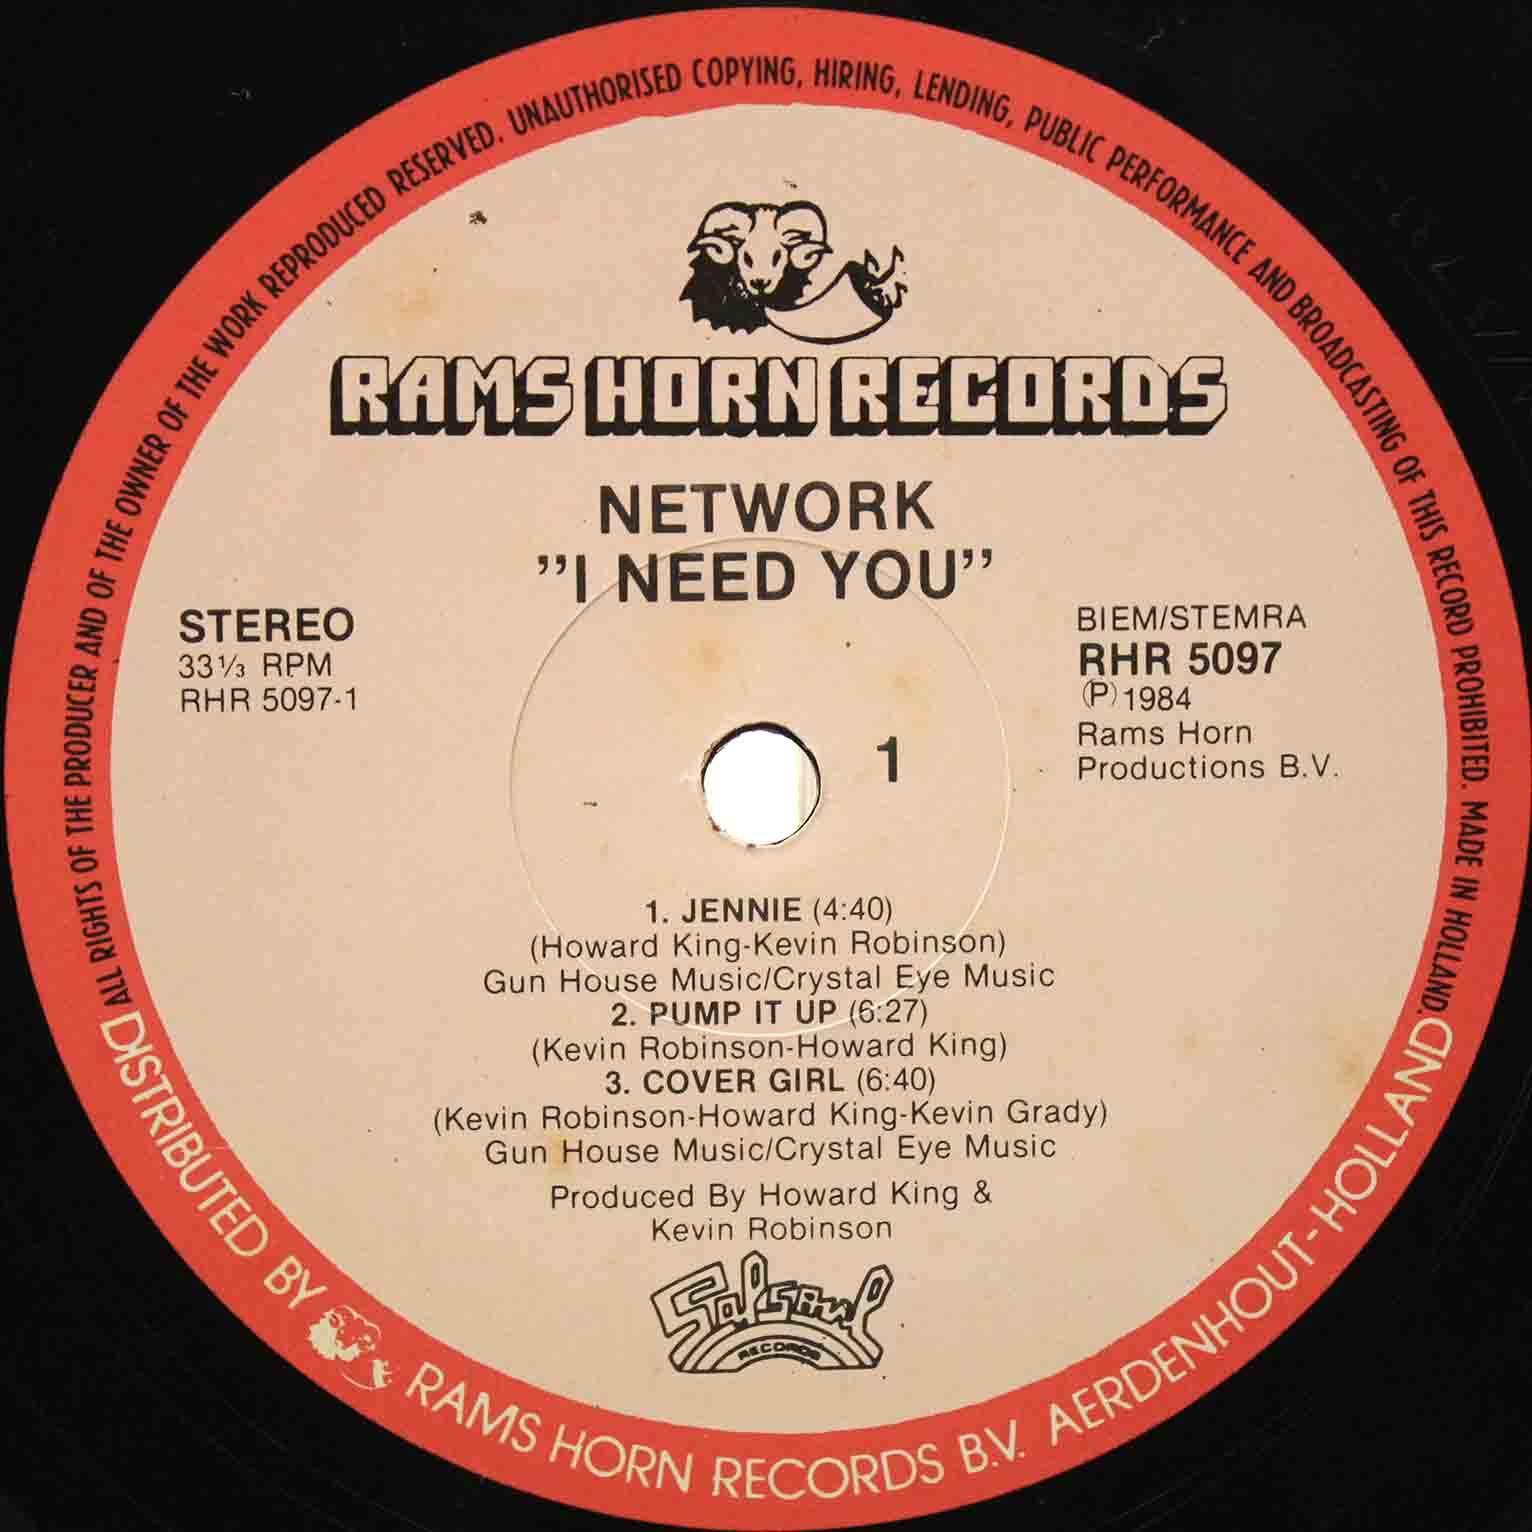 Network I Need You 03